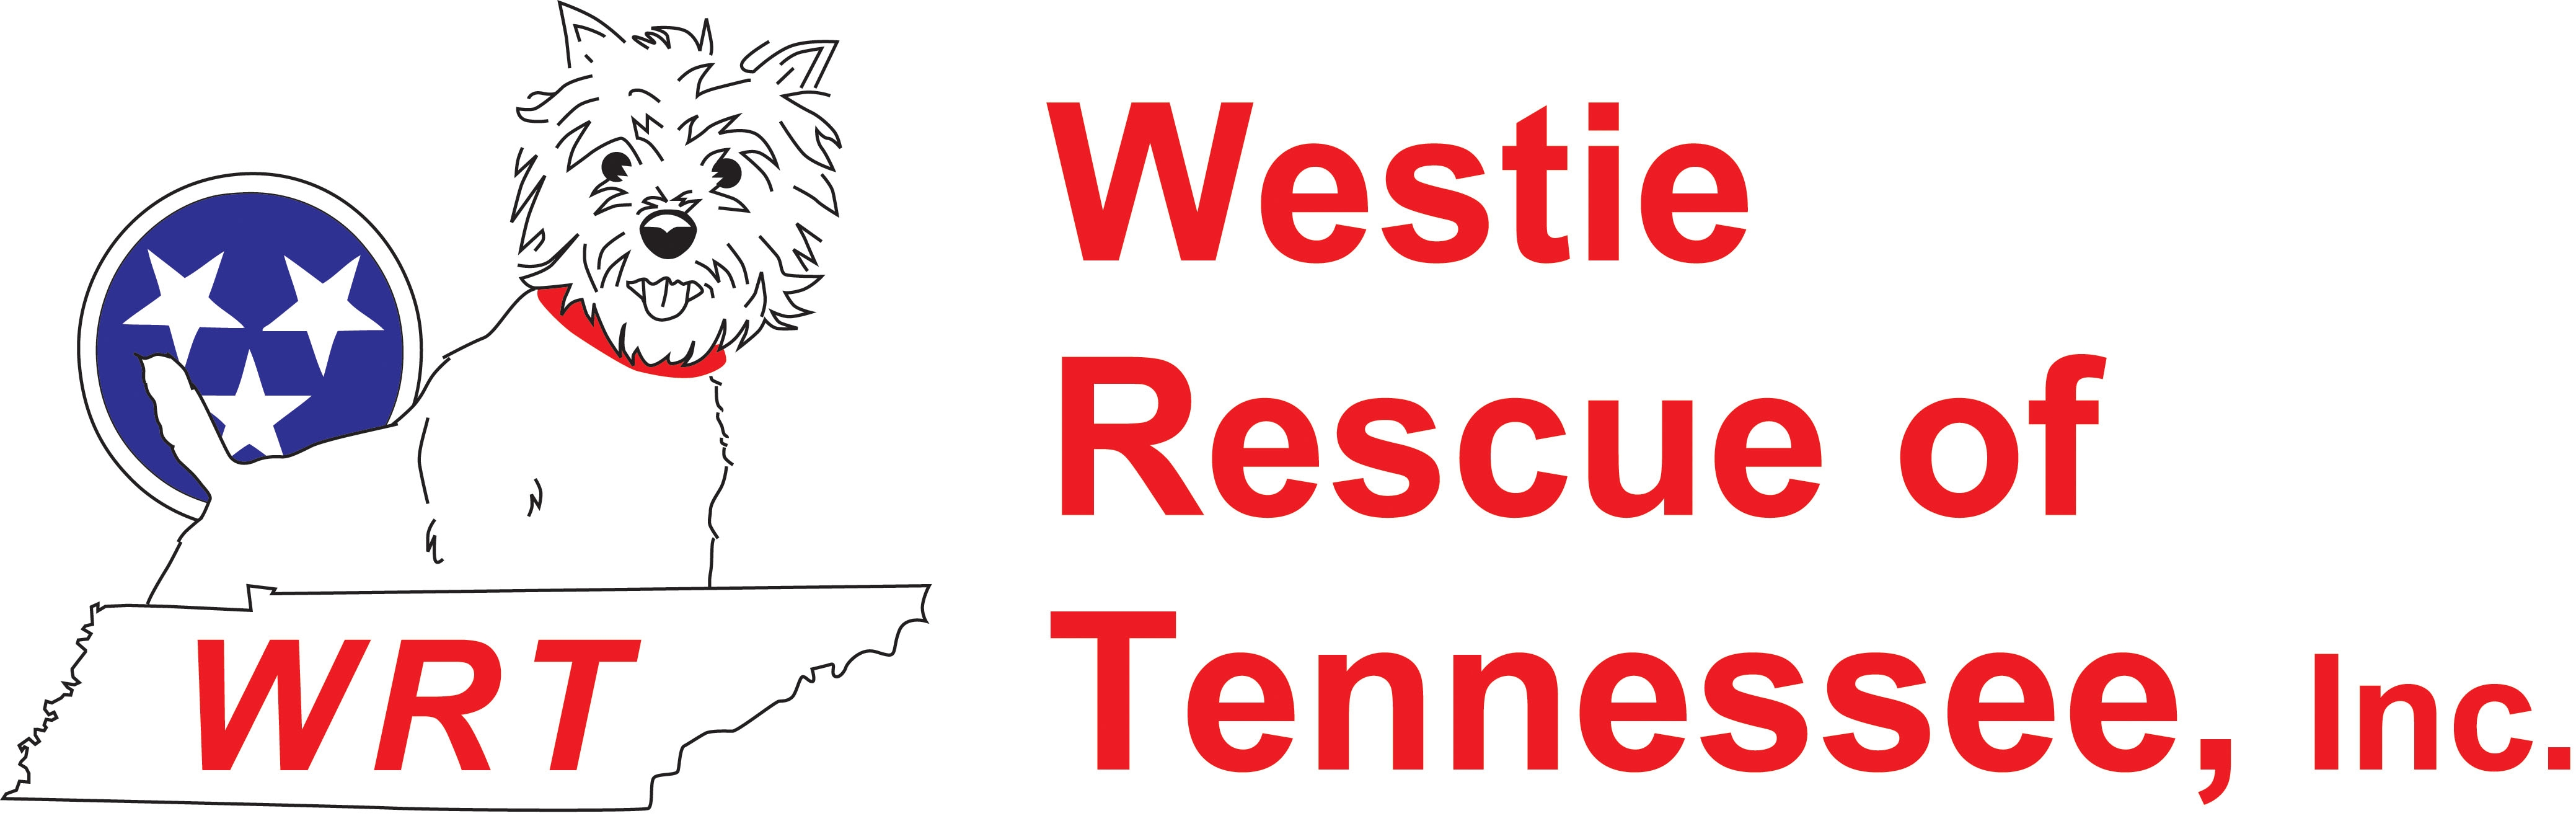 Westie Rescue of Tennessee & Westie Rescue of Alabama